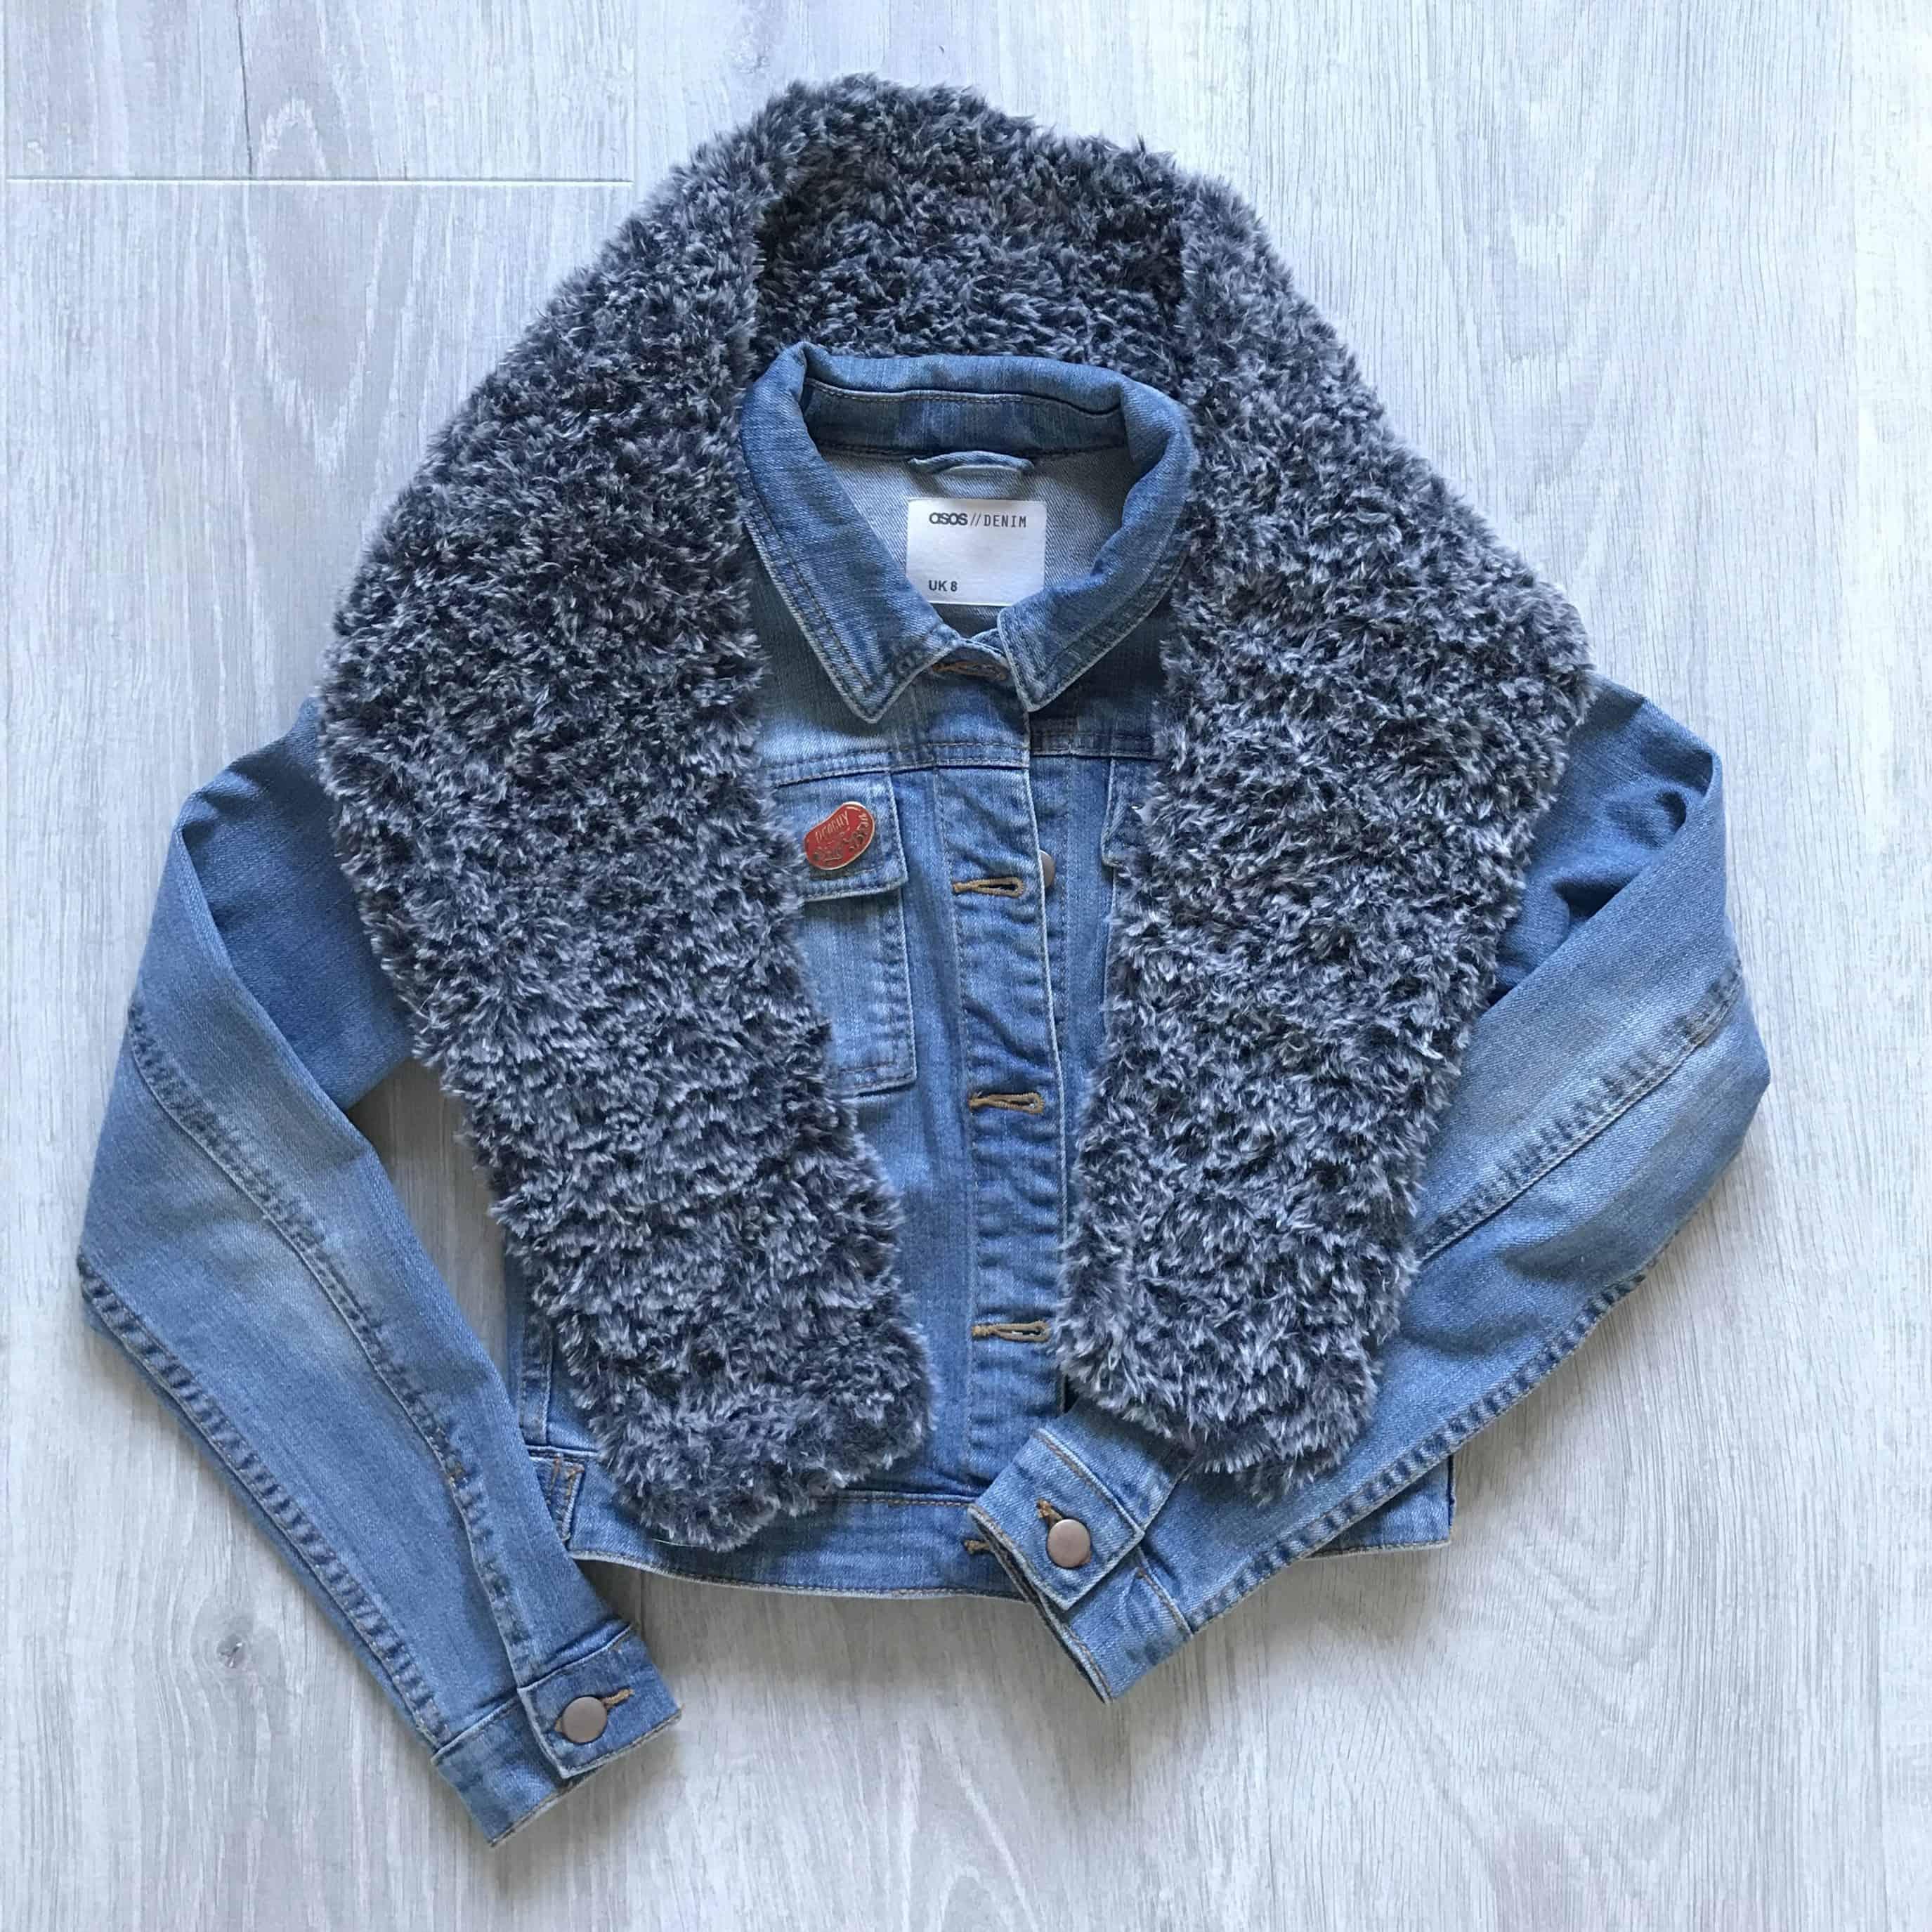 Faux fur crochet scarf with denim jacket